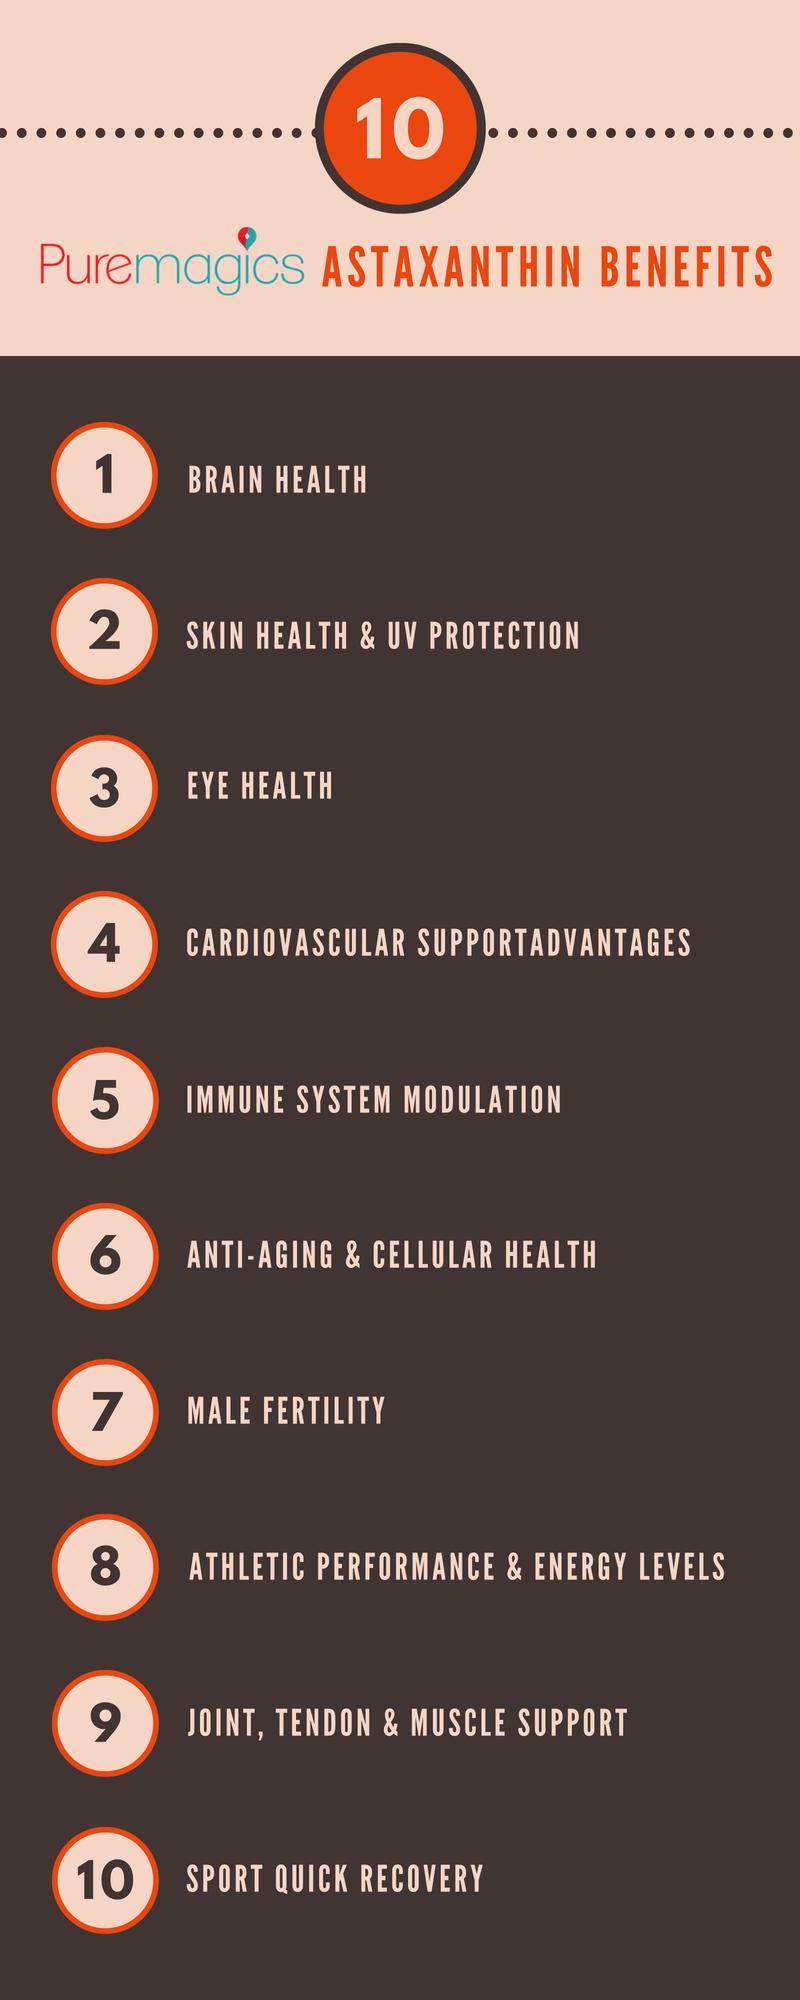 Puremagics Astaxanthin Benefits Meditation Benefits Stress Symptoms This Or That Questions